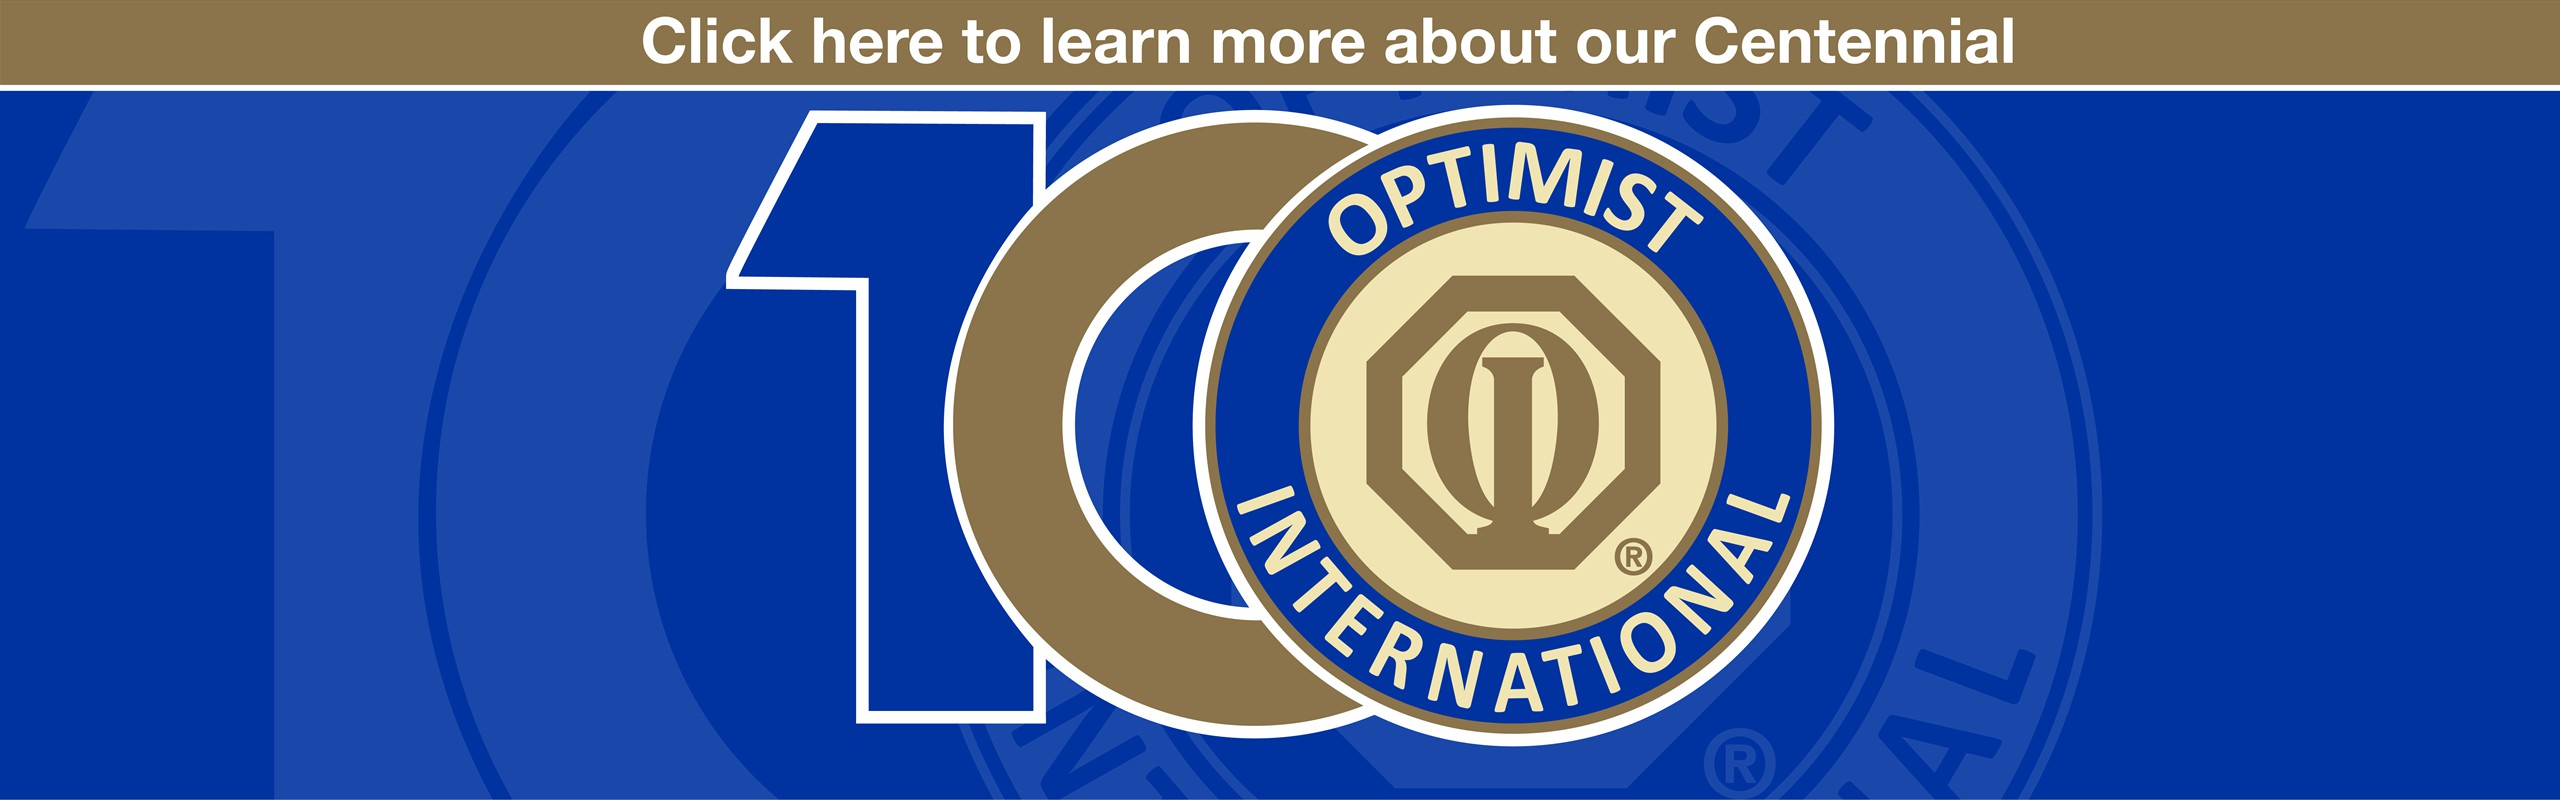 009 Essay Example Centennial Optimist International Wondrous Contest Winners Due Date Oratorical Full